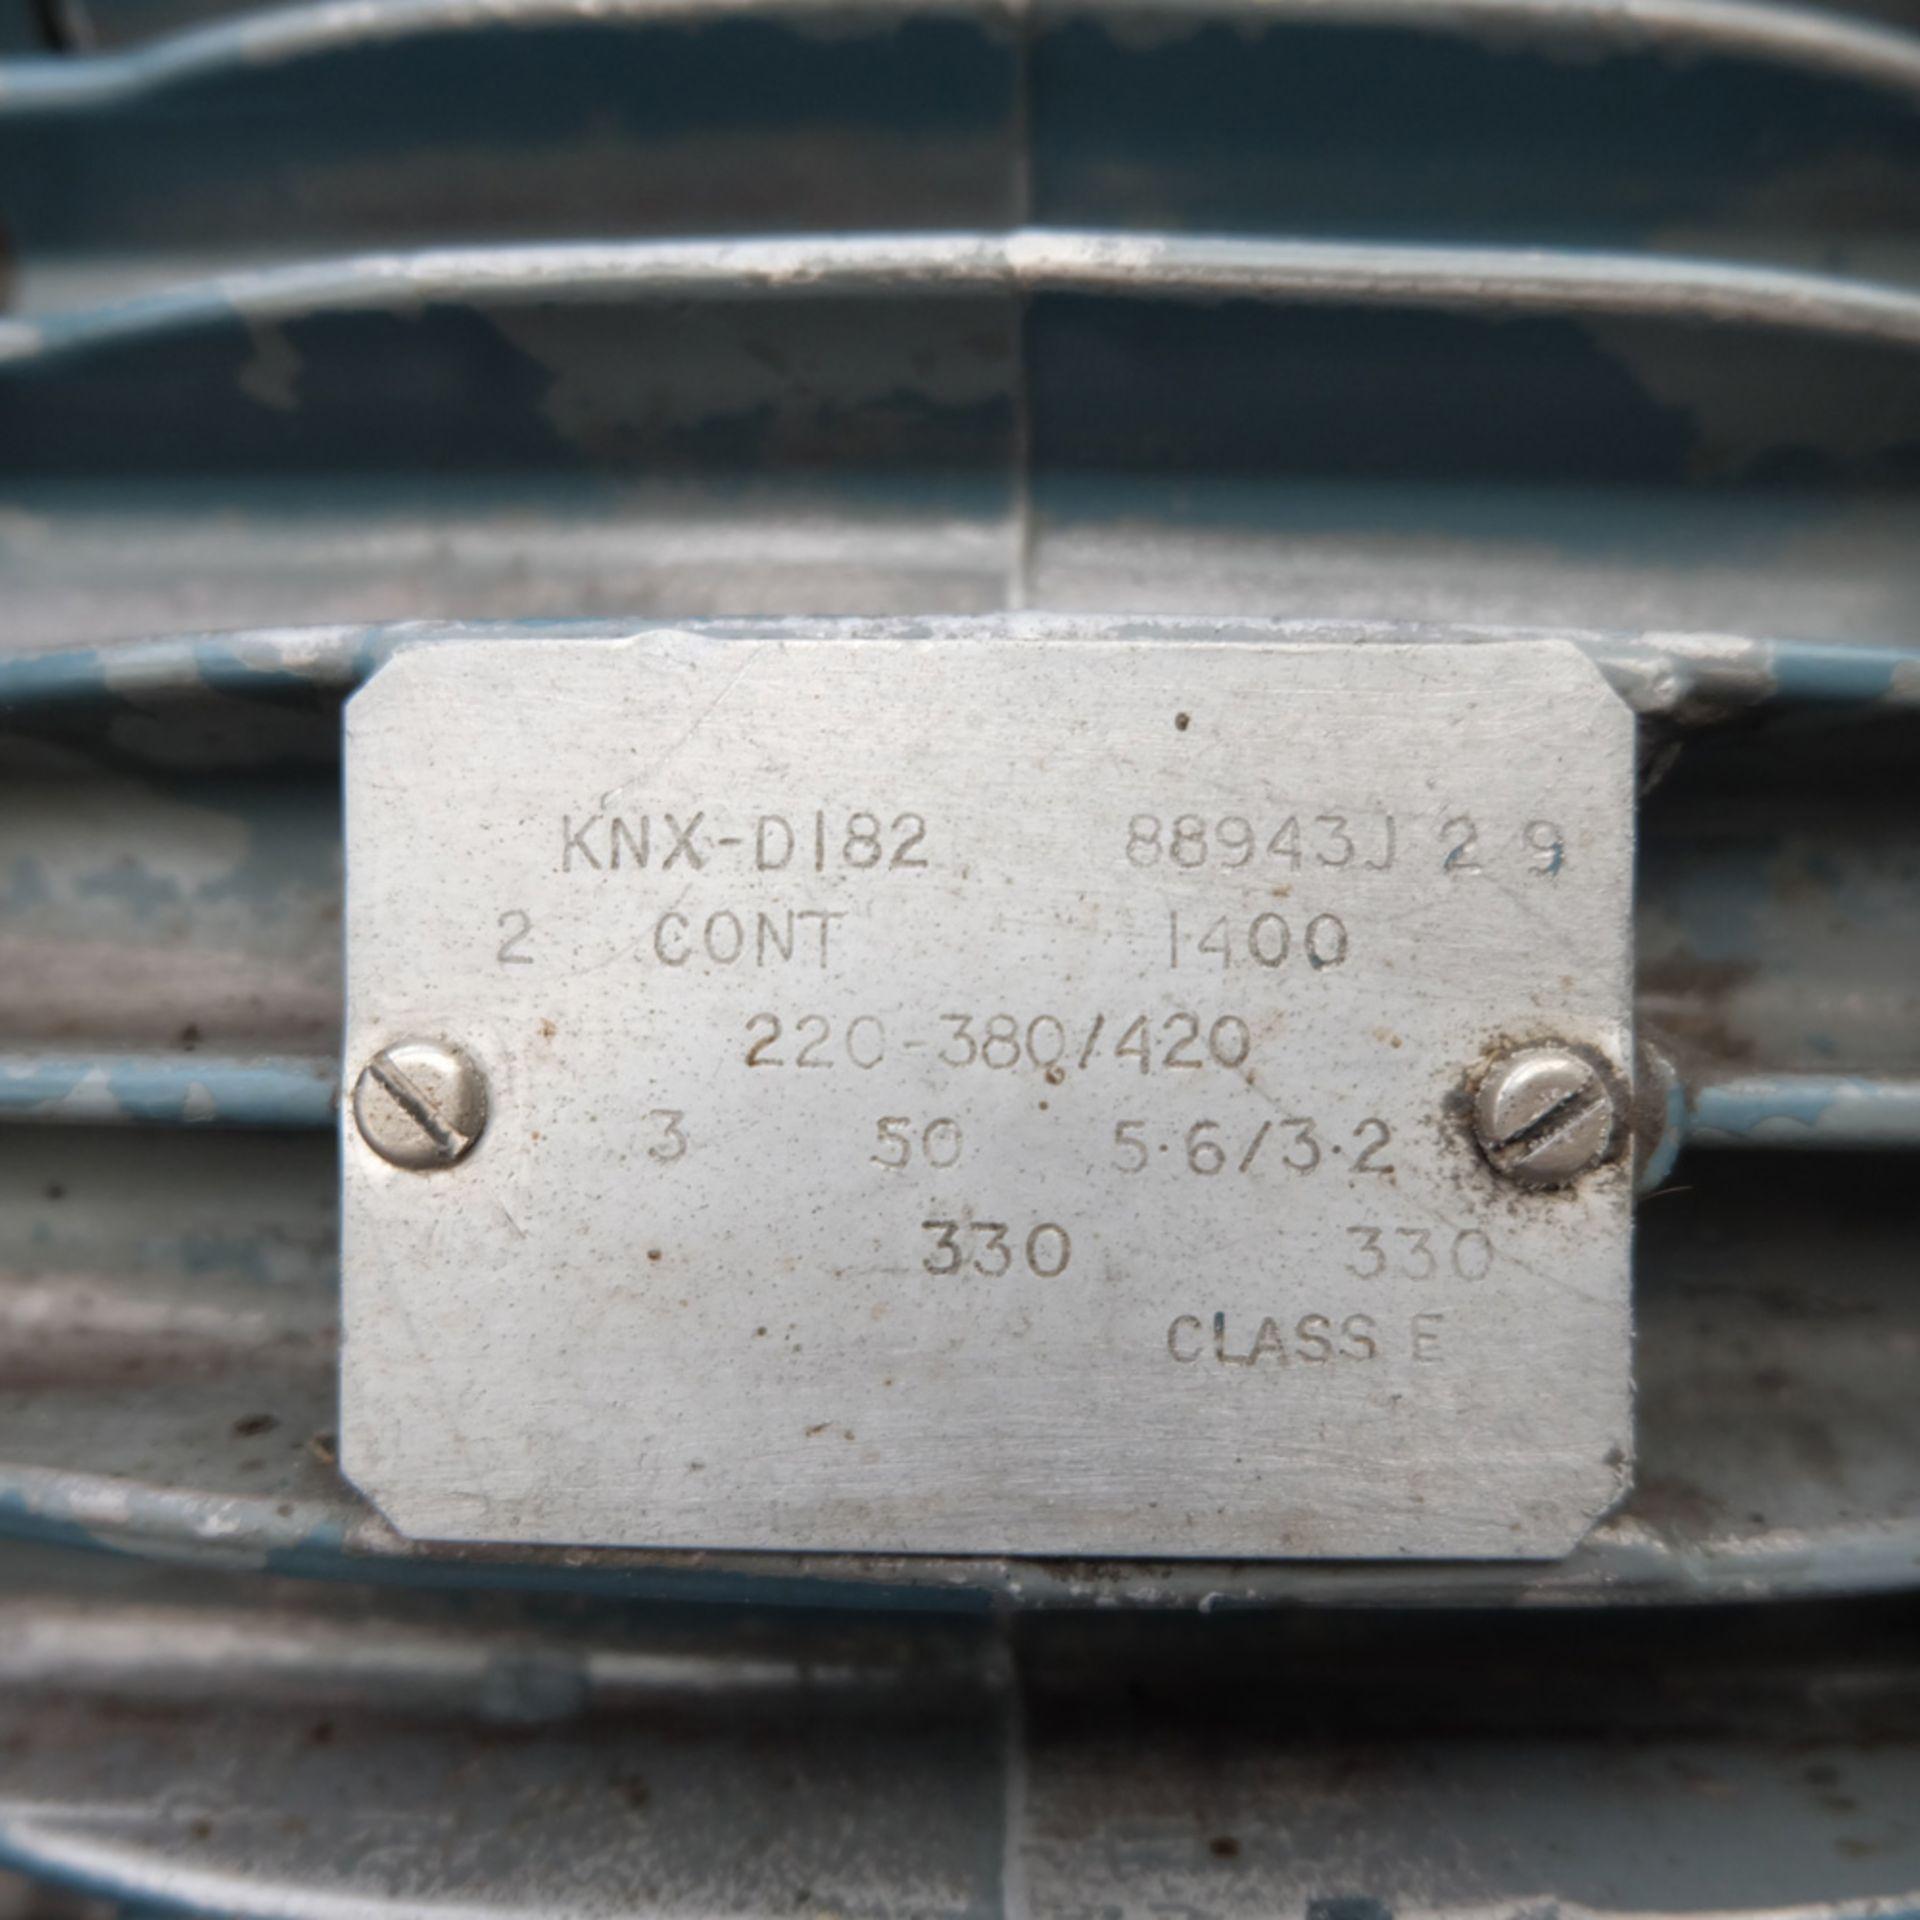 "Jones & Shipman Model 1311 EIU Universal Cylindrical Grinder. Capacity 18"" x 10"". - Image 9 of 12"